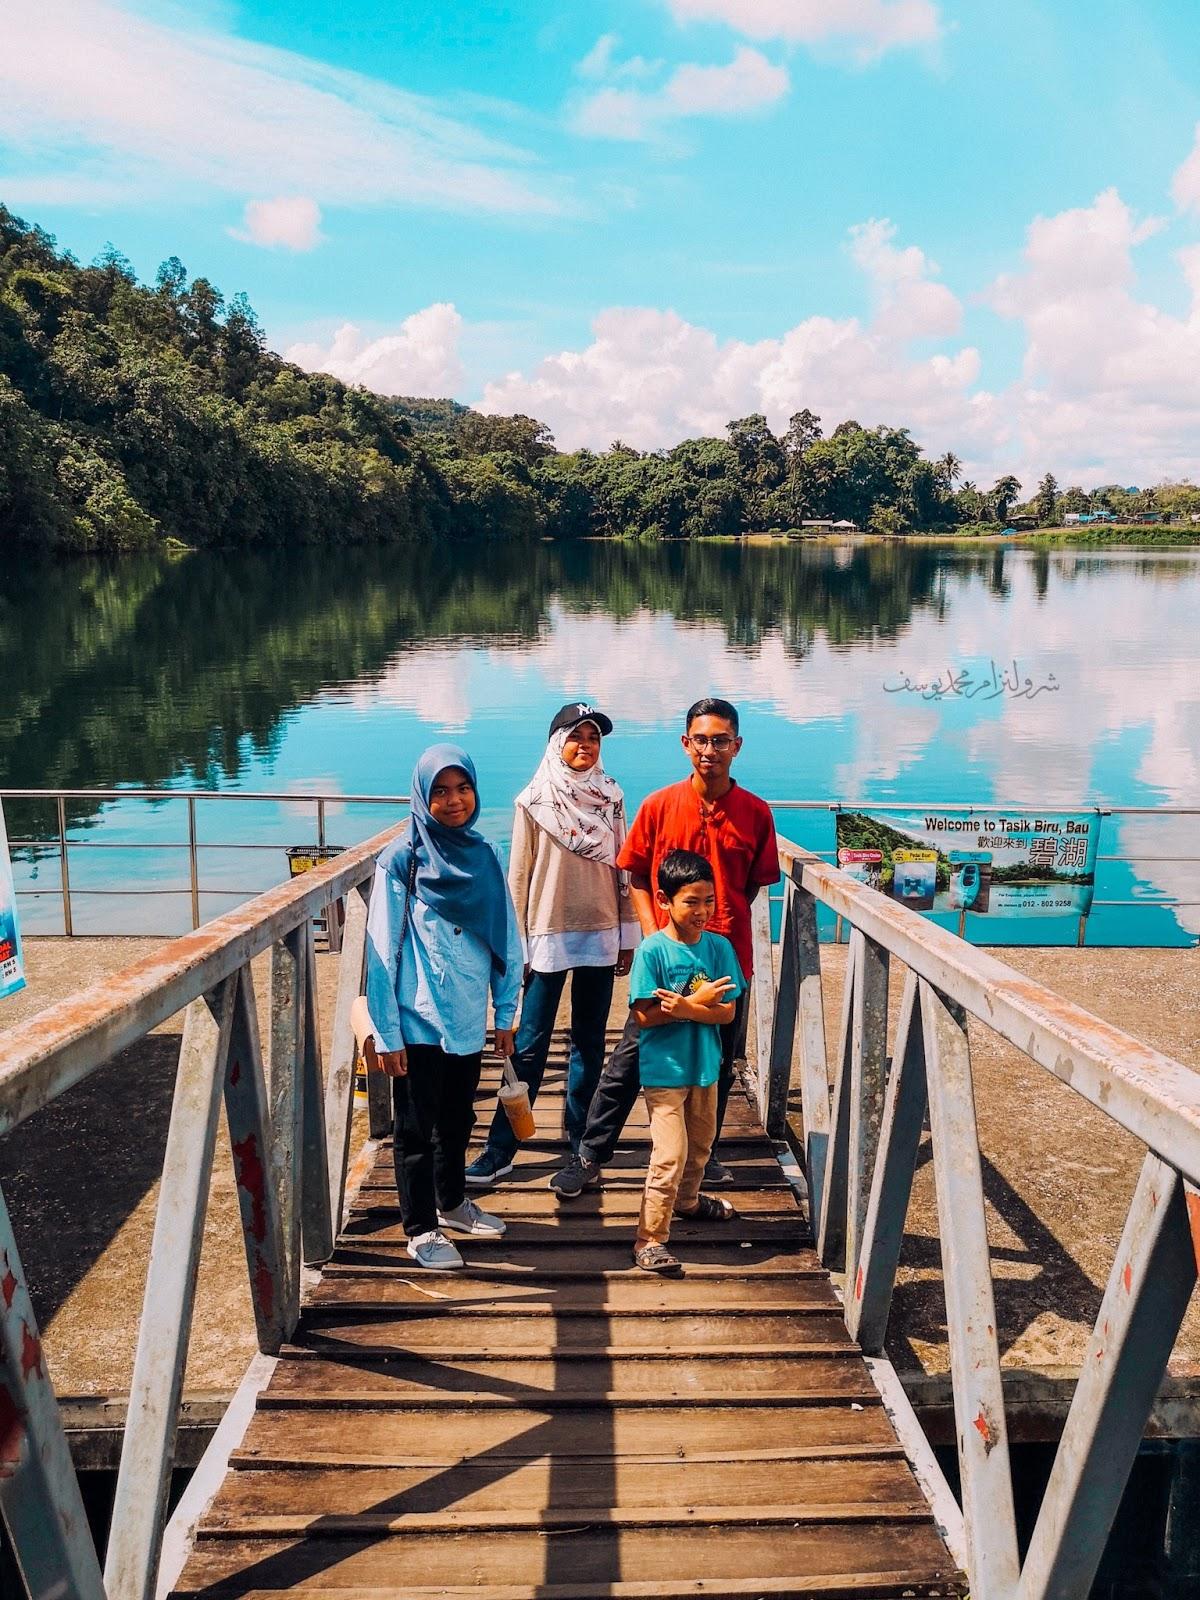 Tasik Biru Bau, Sarawak - kids